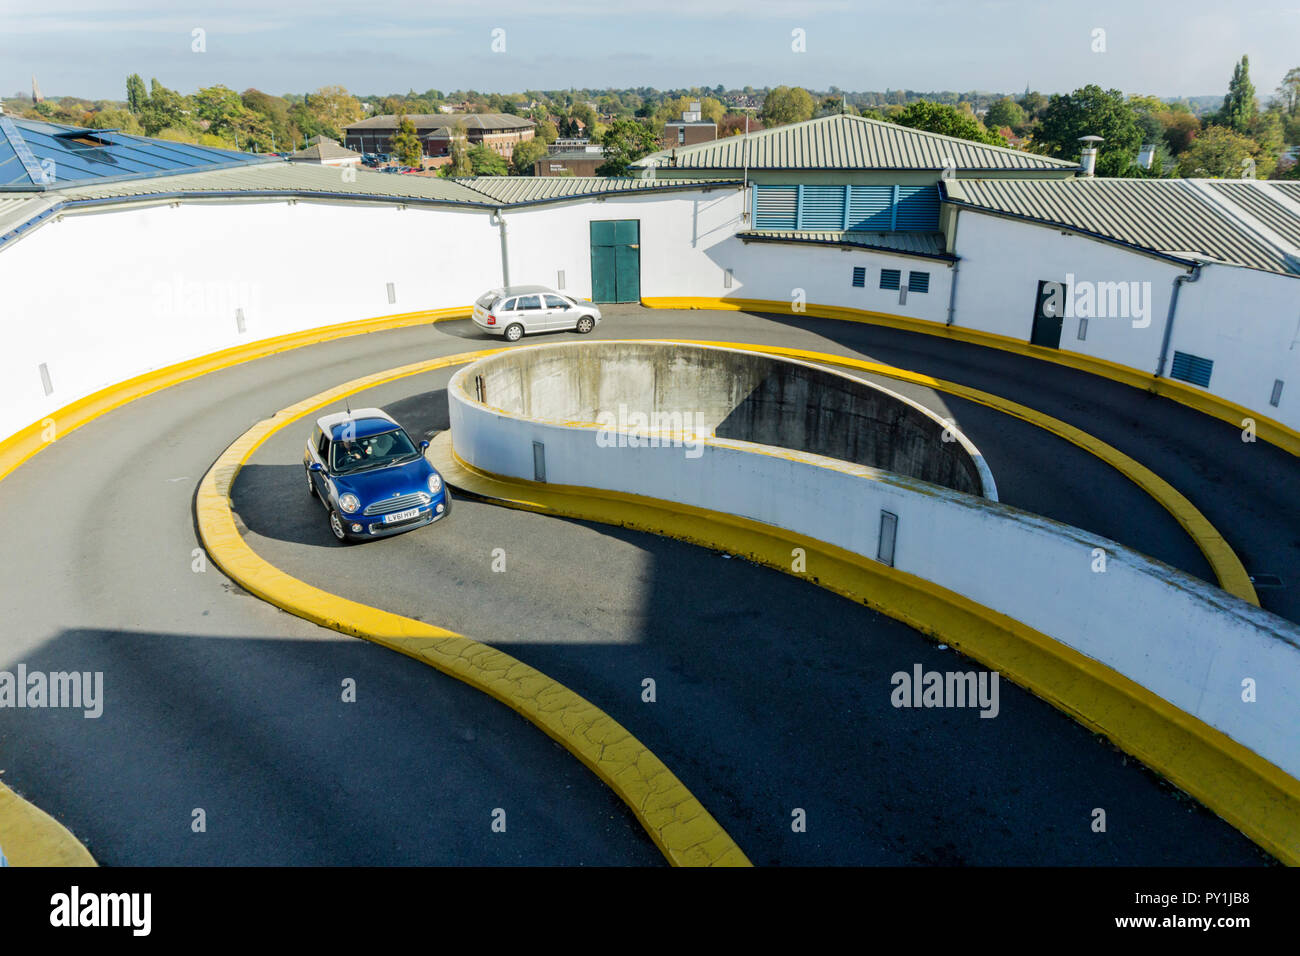 Concrete spiral ramp to multi-storey car park. - Stock Image